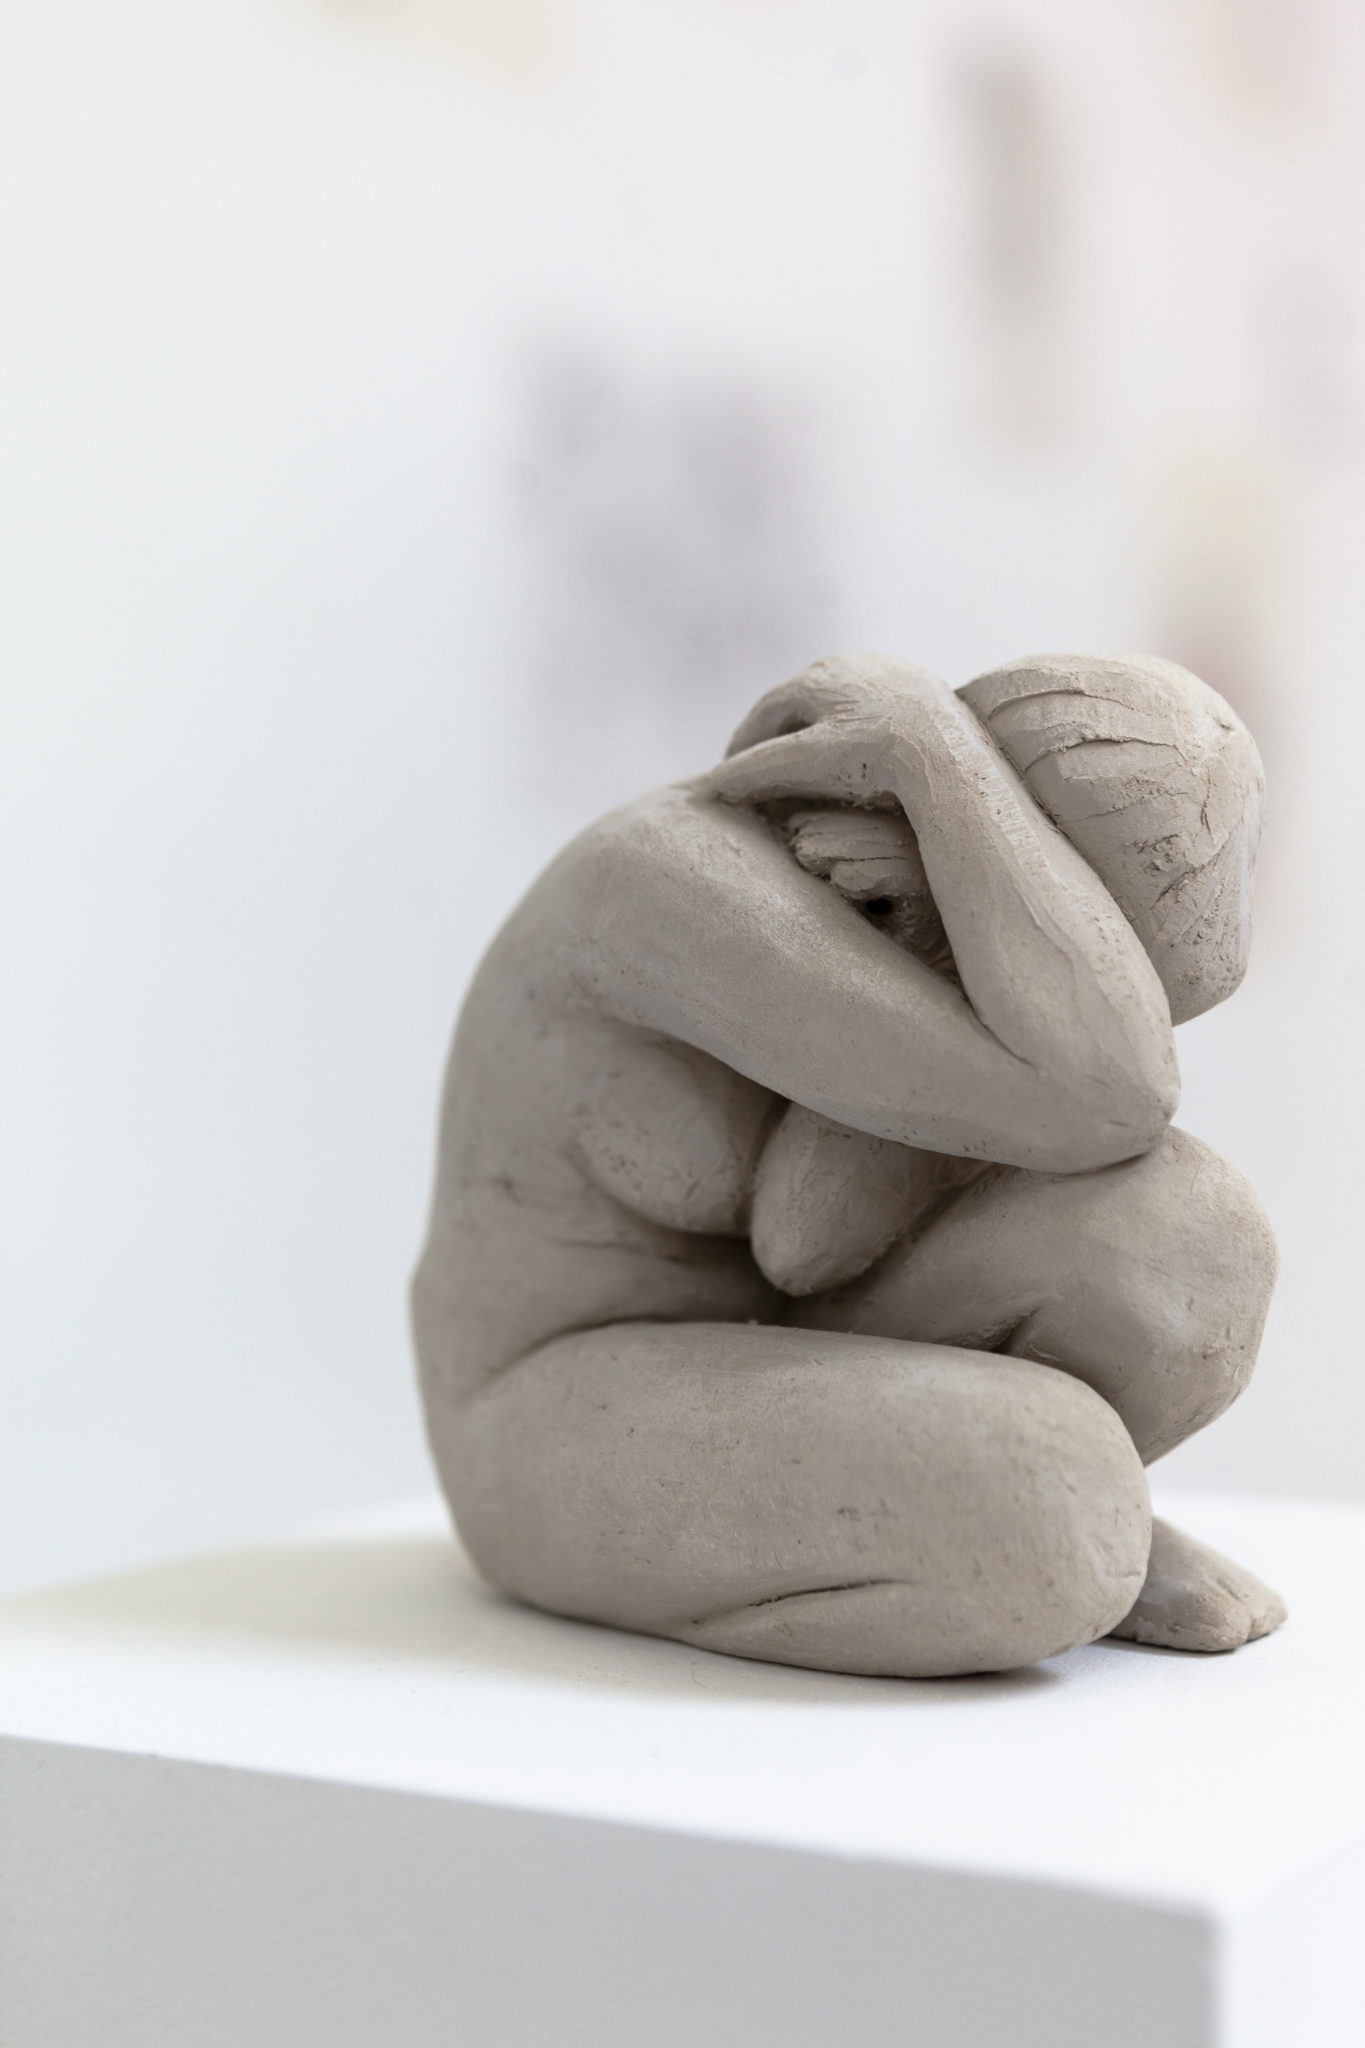 Franziska Dathe, Bedrückung, Ton (ungebrannt), 17 x 10 x 13 cm, 2021